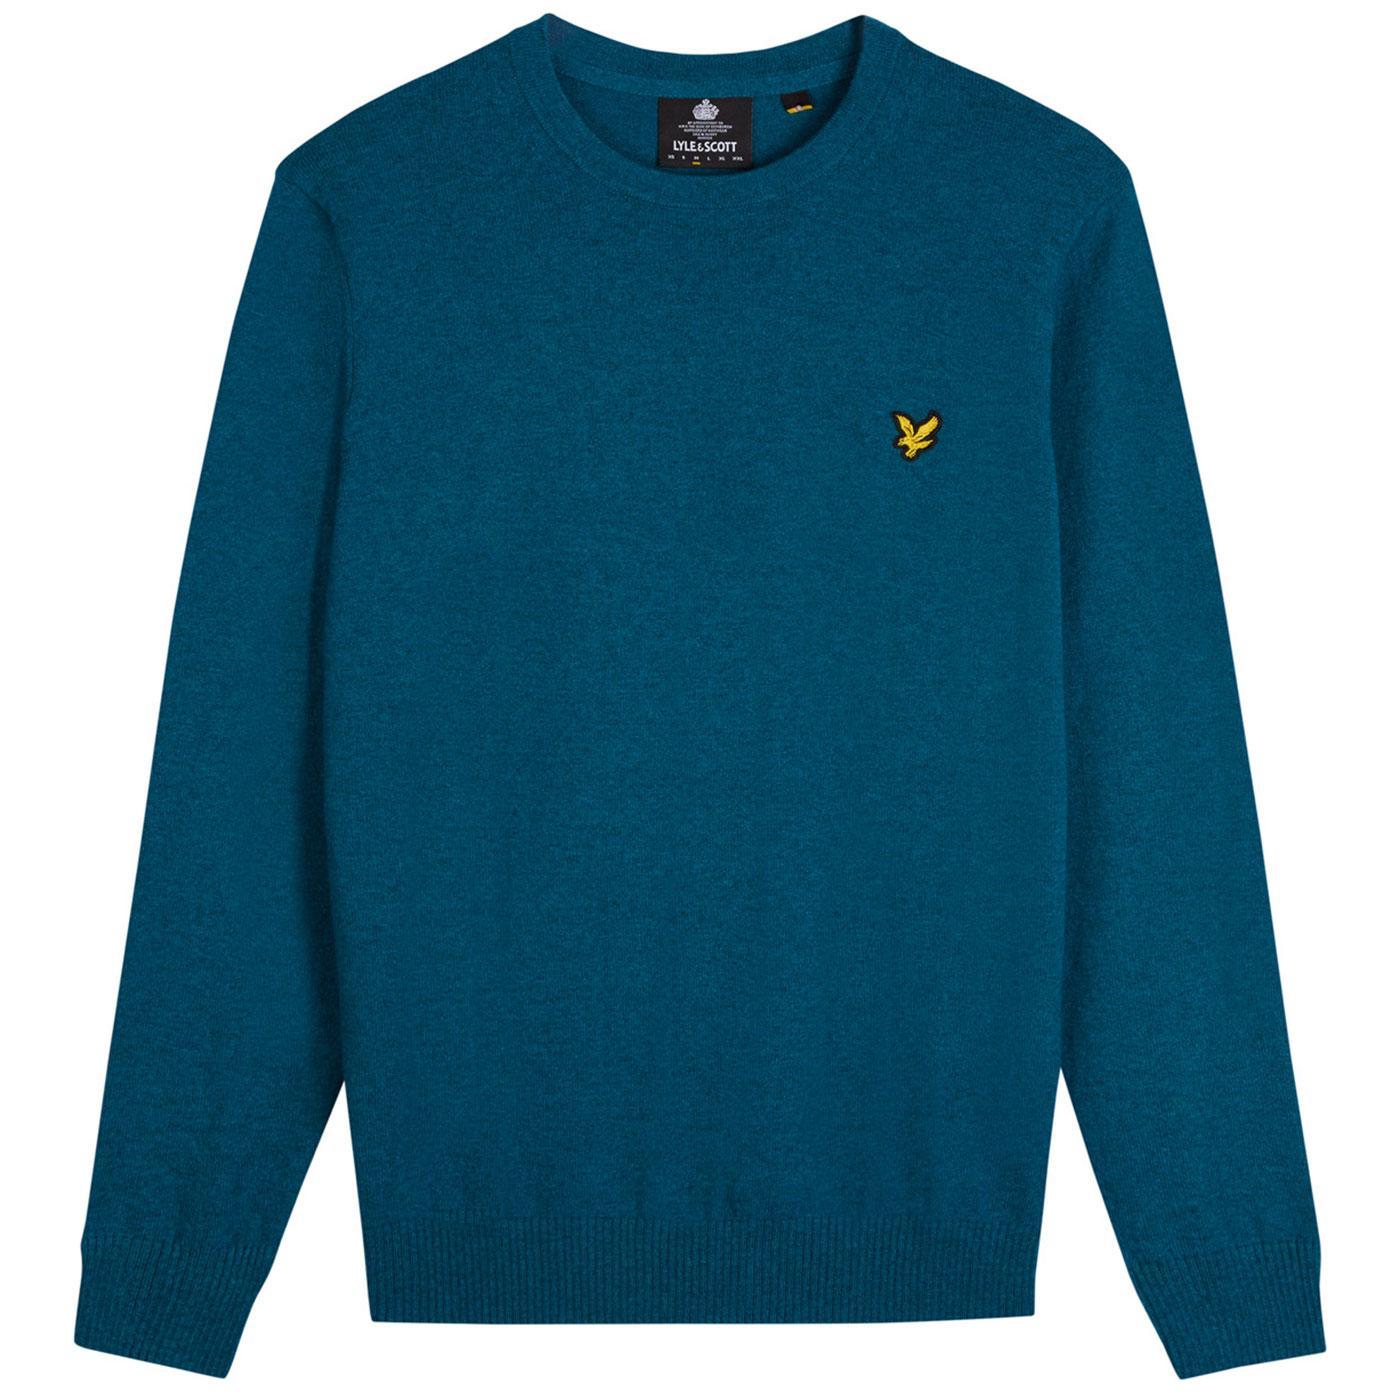 LYLE AND SCOTT Retro Merino Wool Knitted Jumper PT